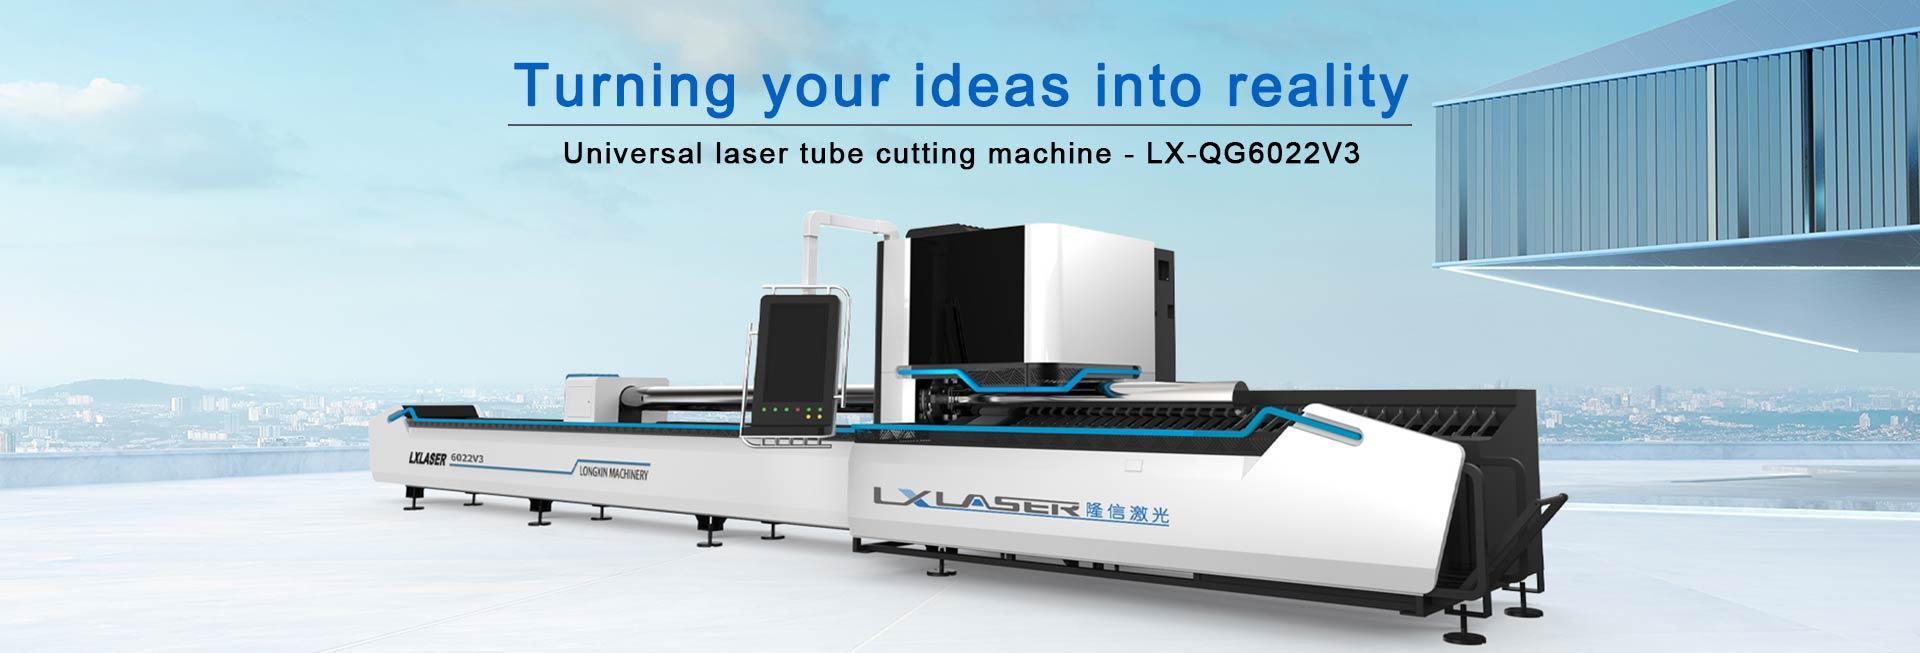 Multi-functional metal tube laser cutting machine LX-QG6022V3